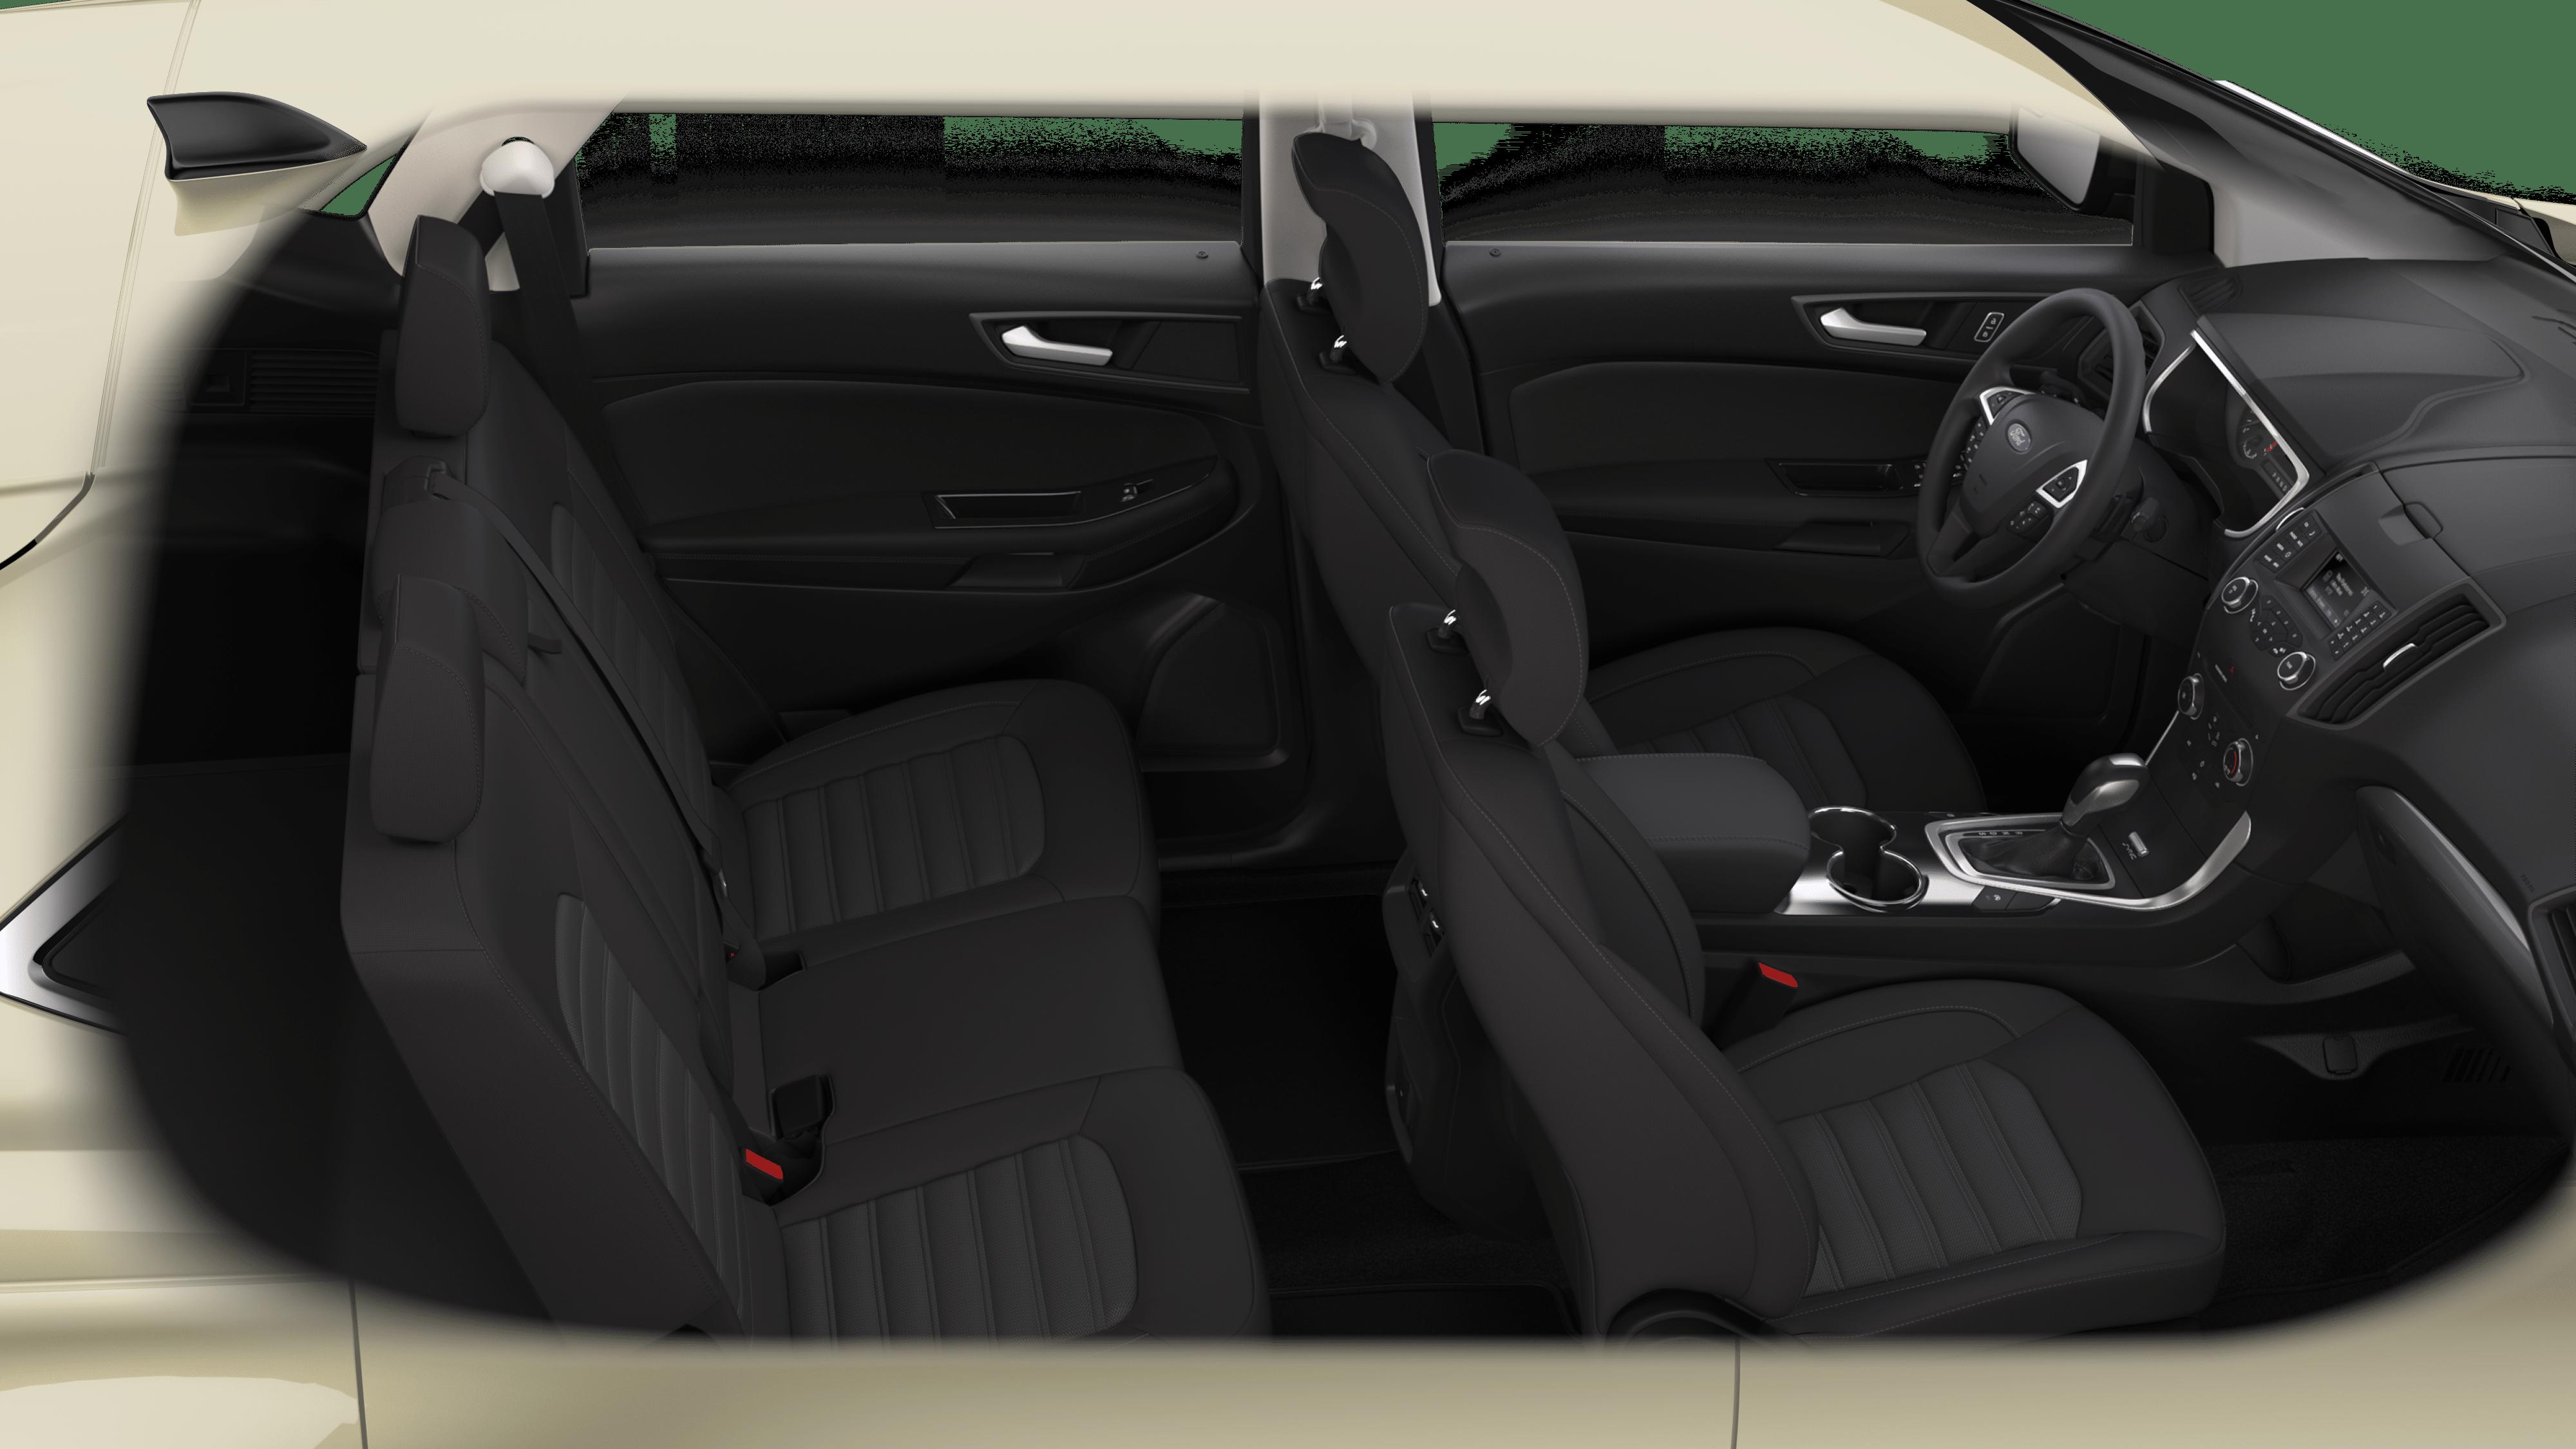 2018 ford edge for sale in natrona heights 2fmpk4g97jbc43305 cochran ford. Black Bedroom Furniture Sets. Home Design Ideas